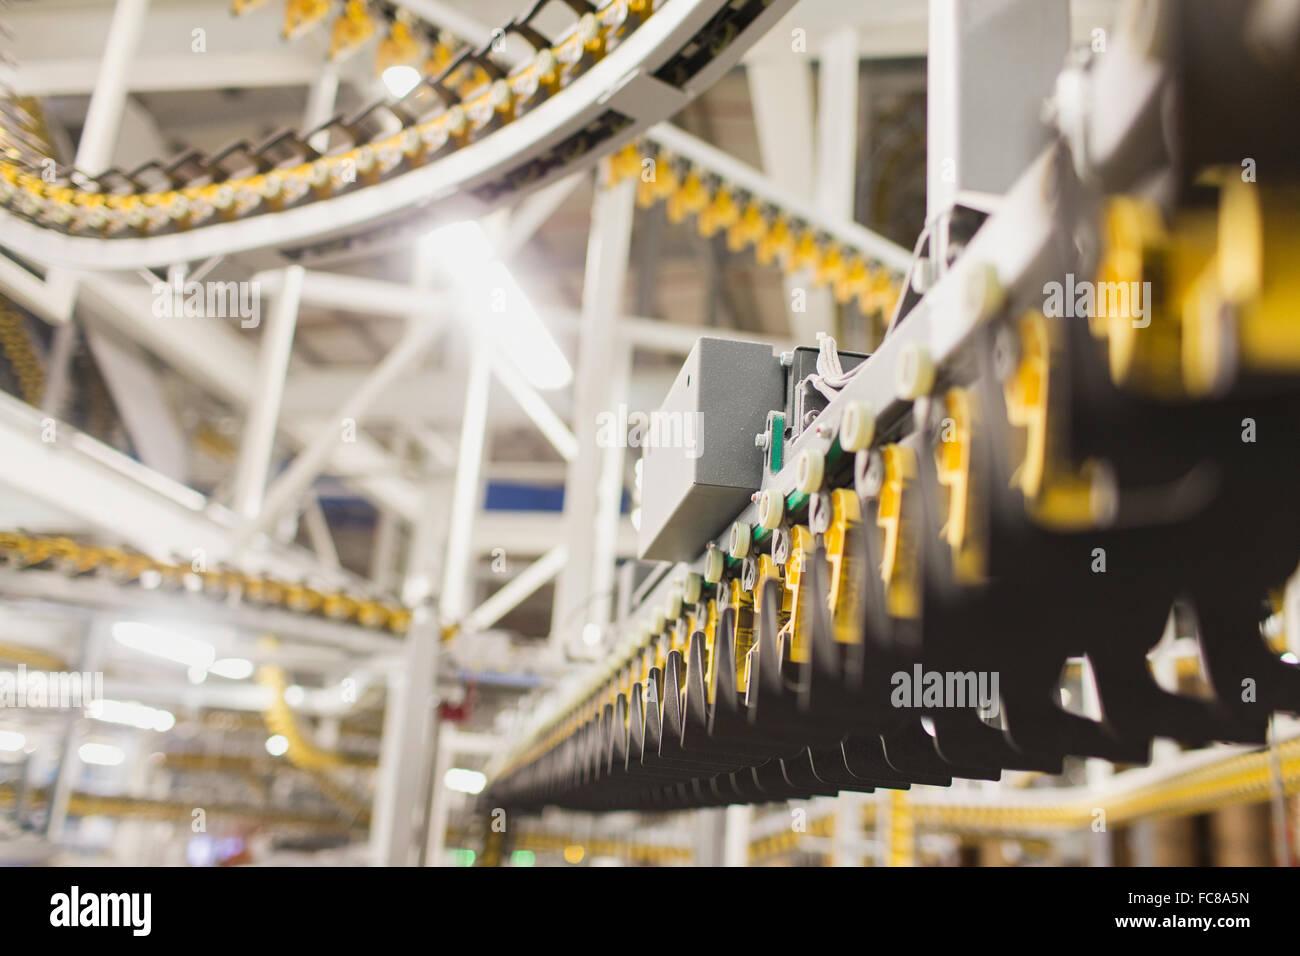 Printing press conveyor belts in printing plant - Stock Image